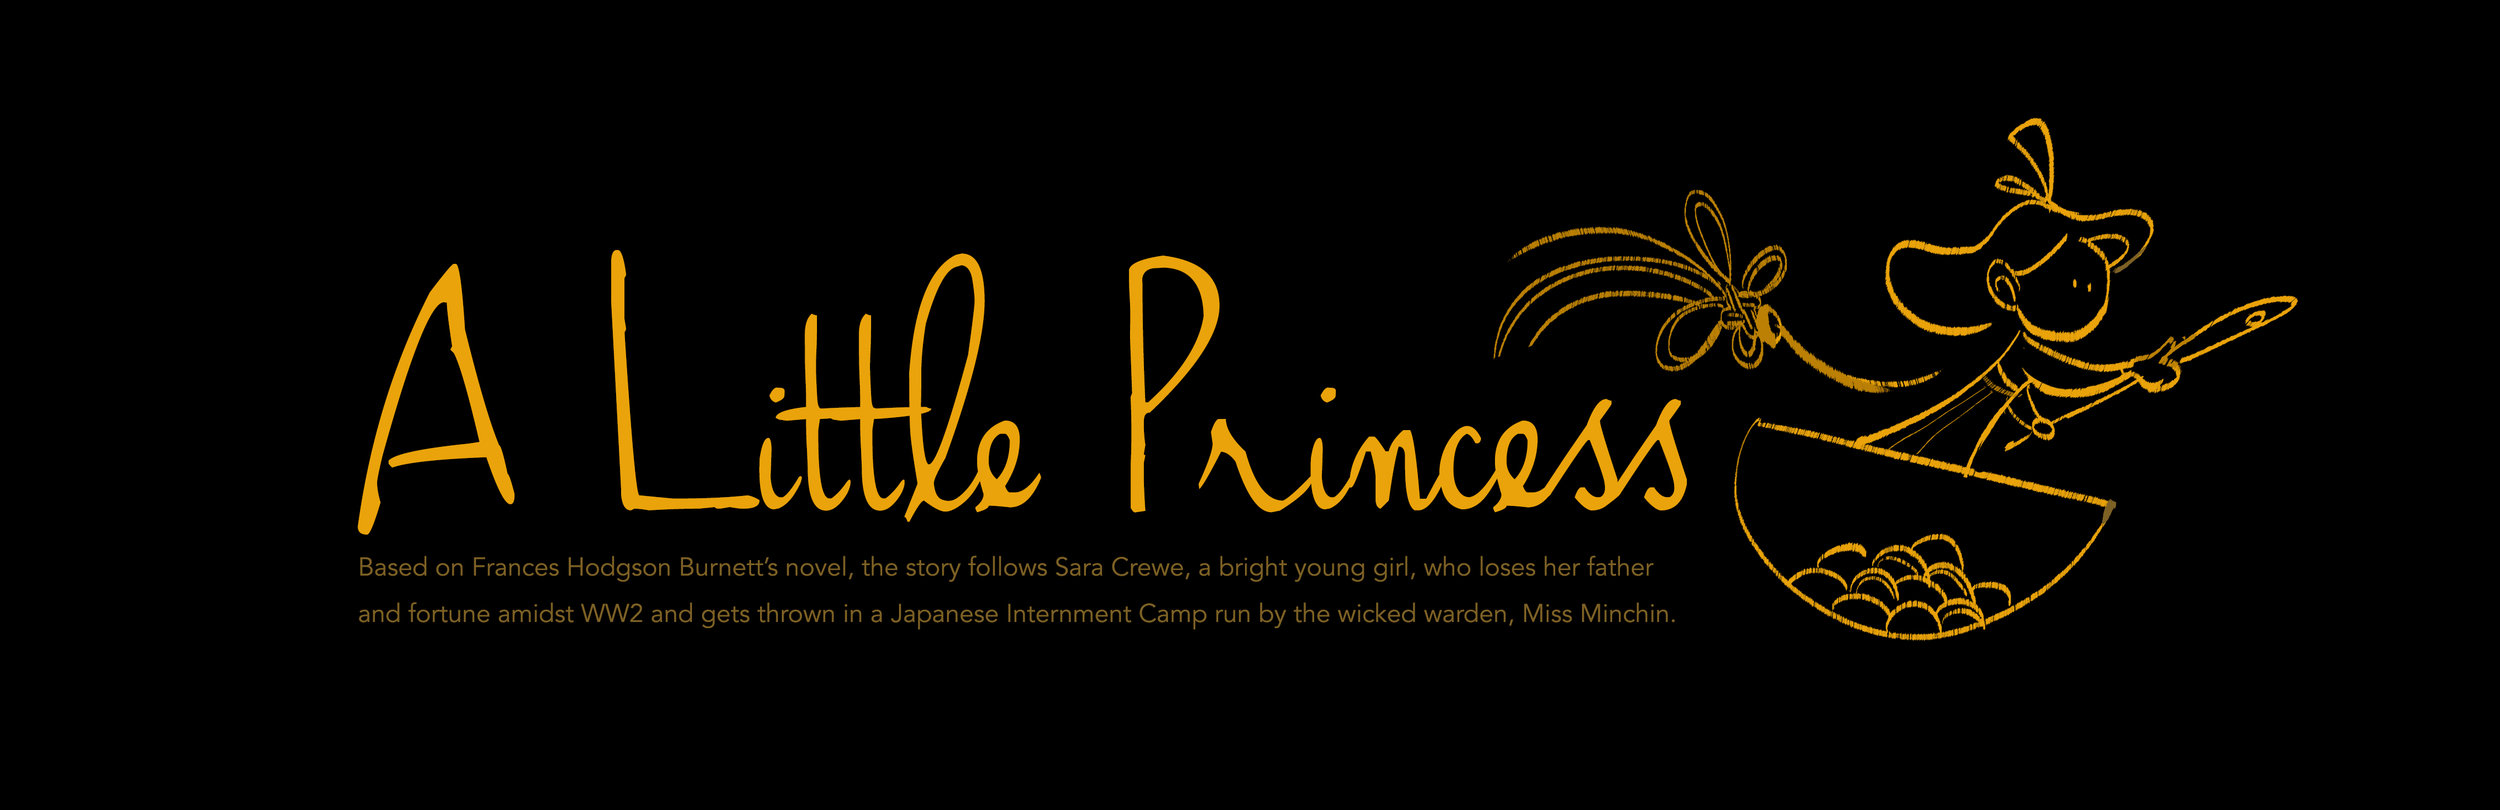 A Little Princess Title Card WEB.jpg